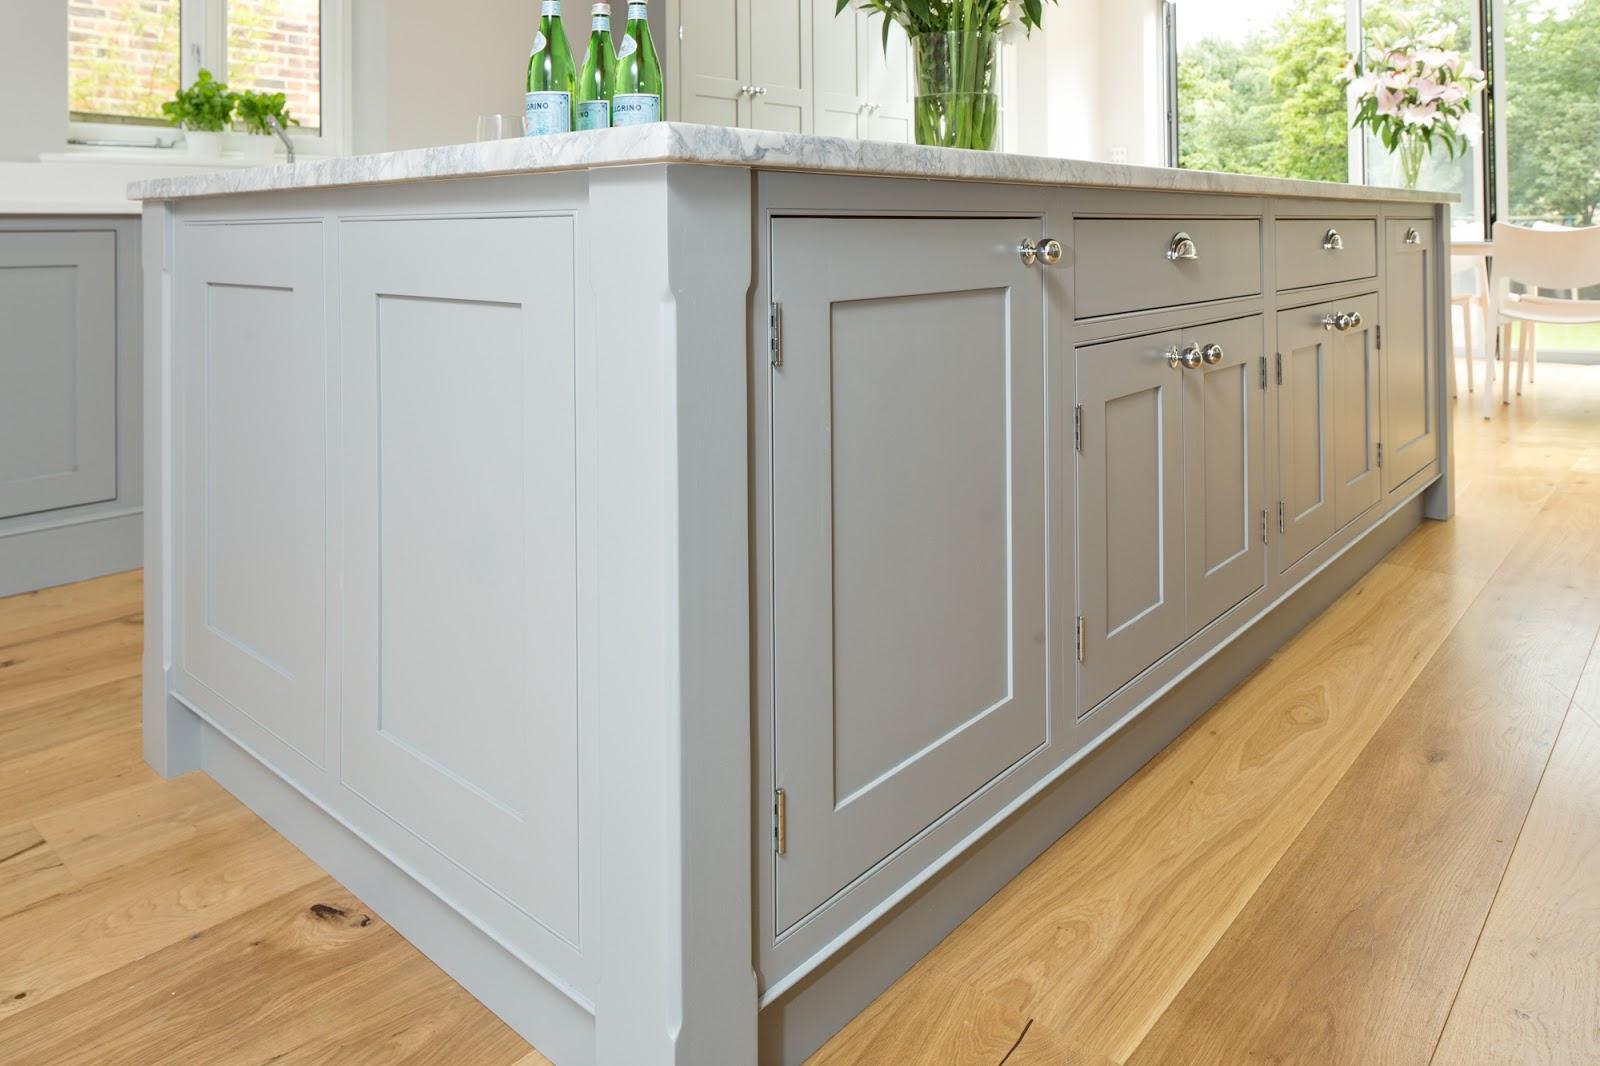 Lead Paint In Kitchen